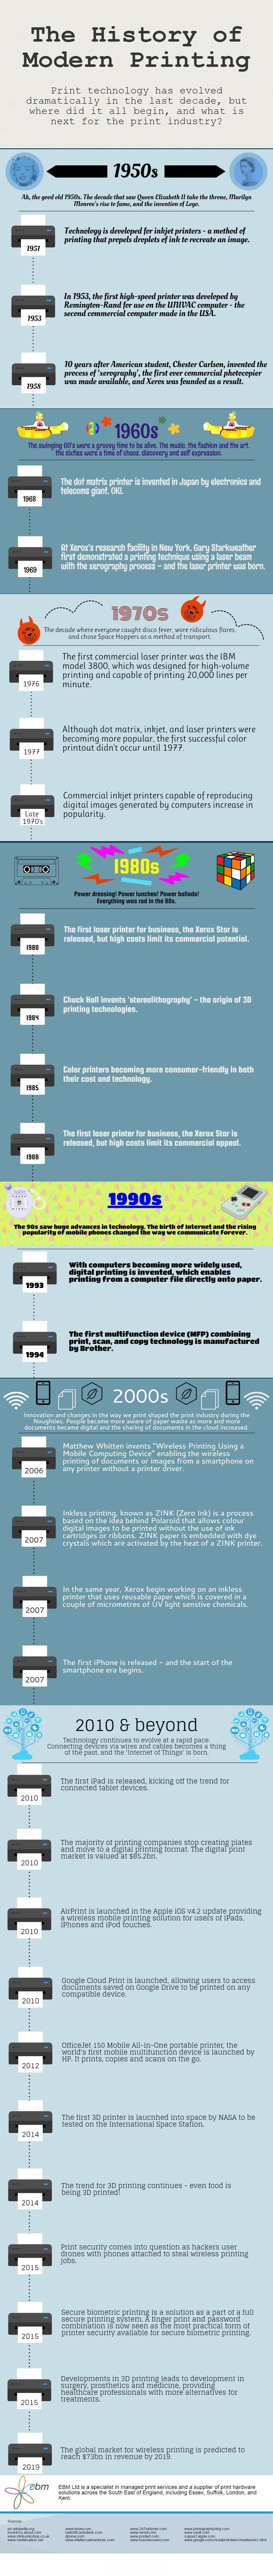 History_Digital_Printing_Infographic_EBM_Ltd